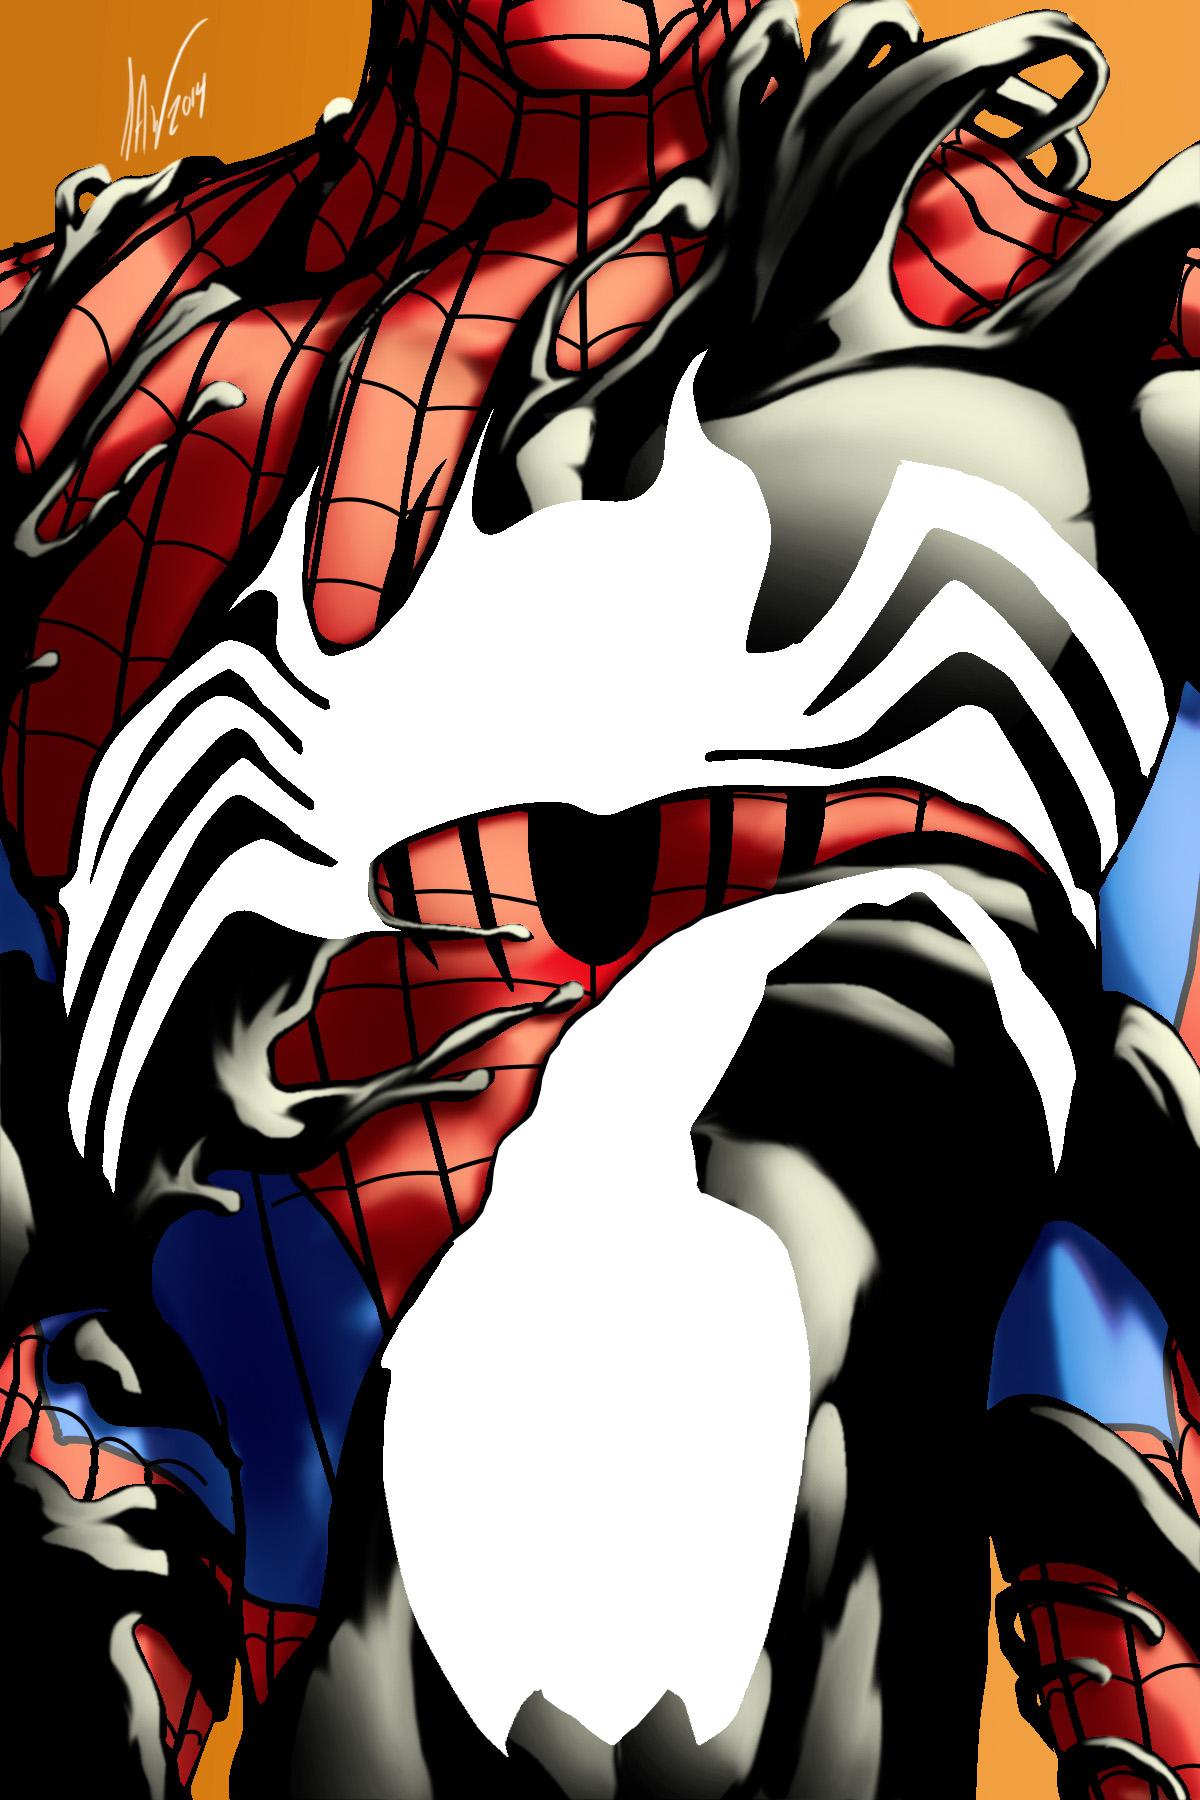 Spiderman-New Suit New Responsibilites 11x17.jpg